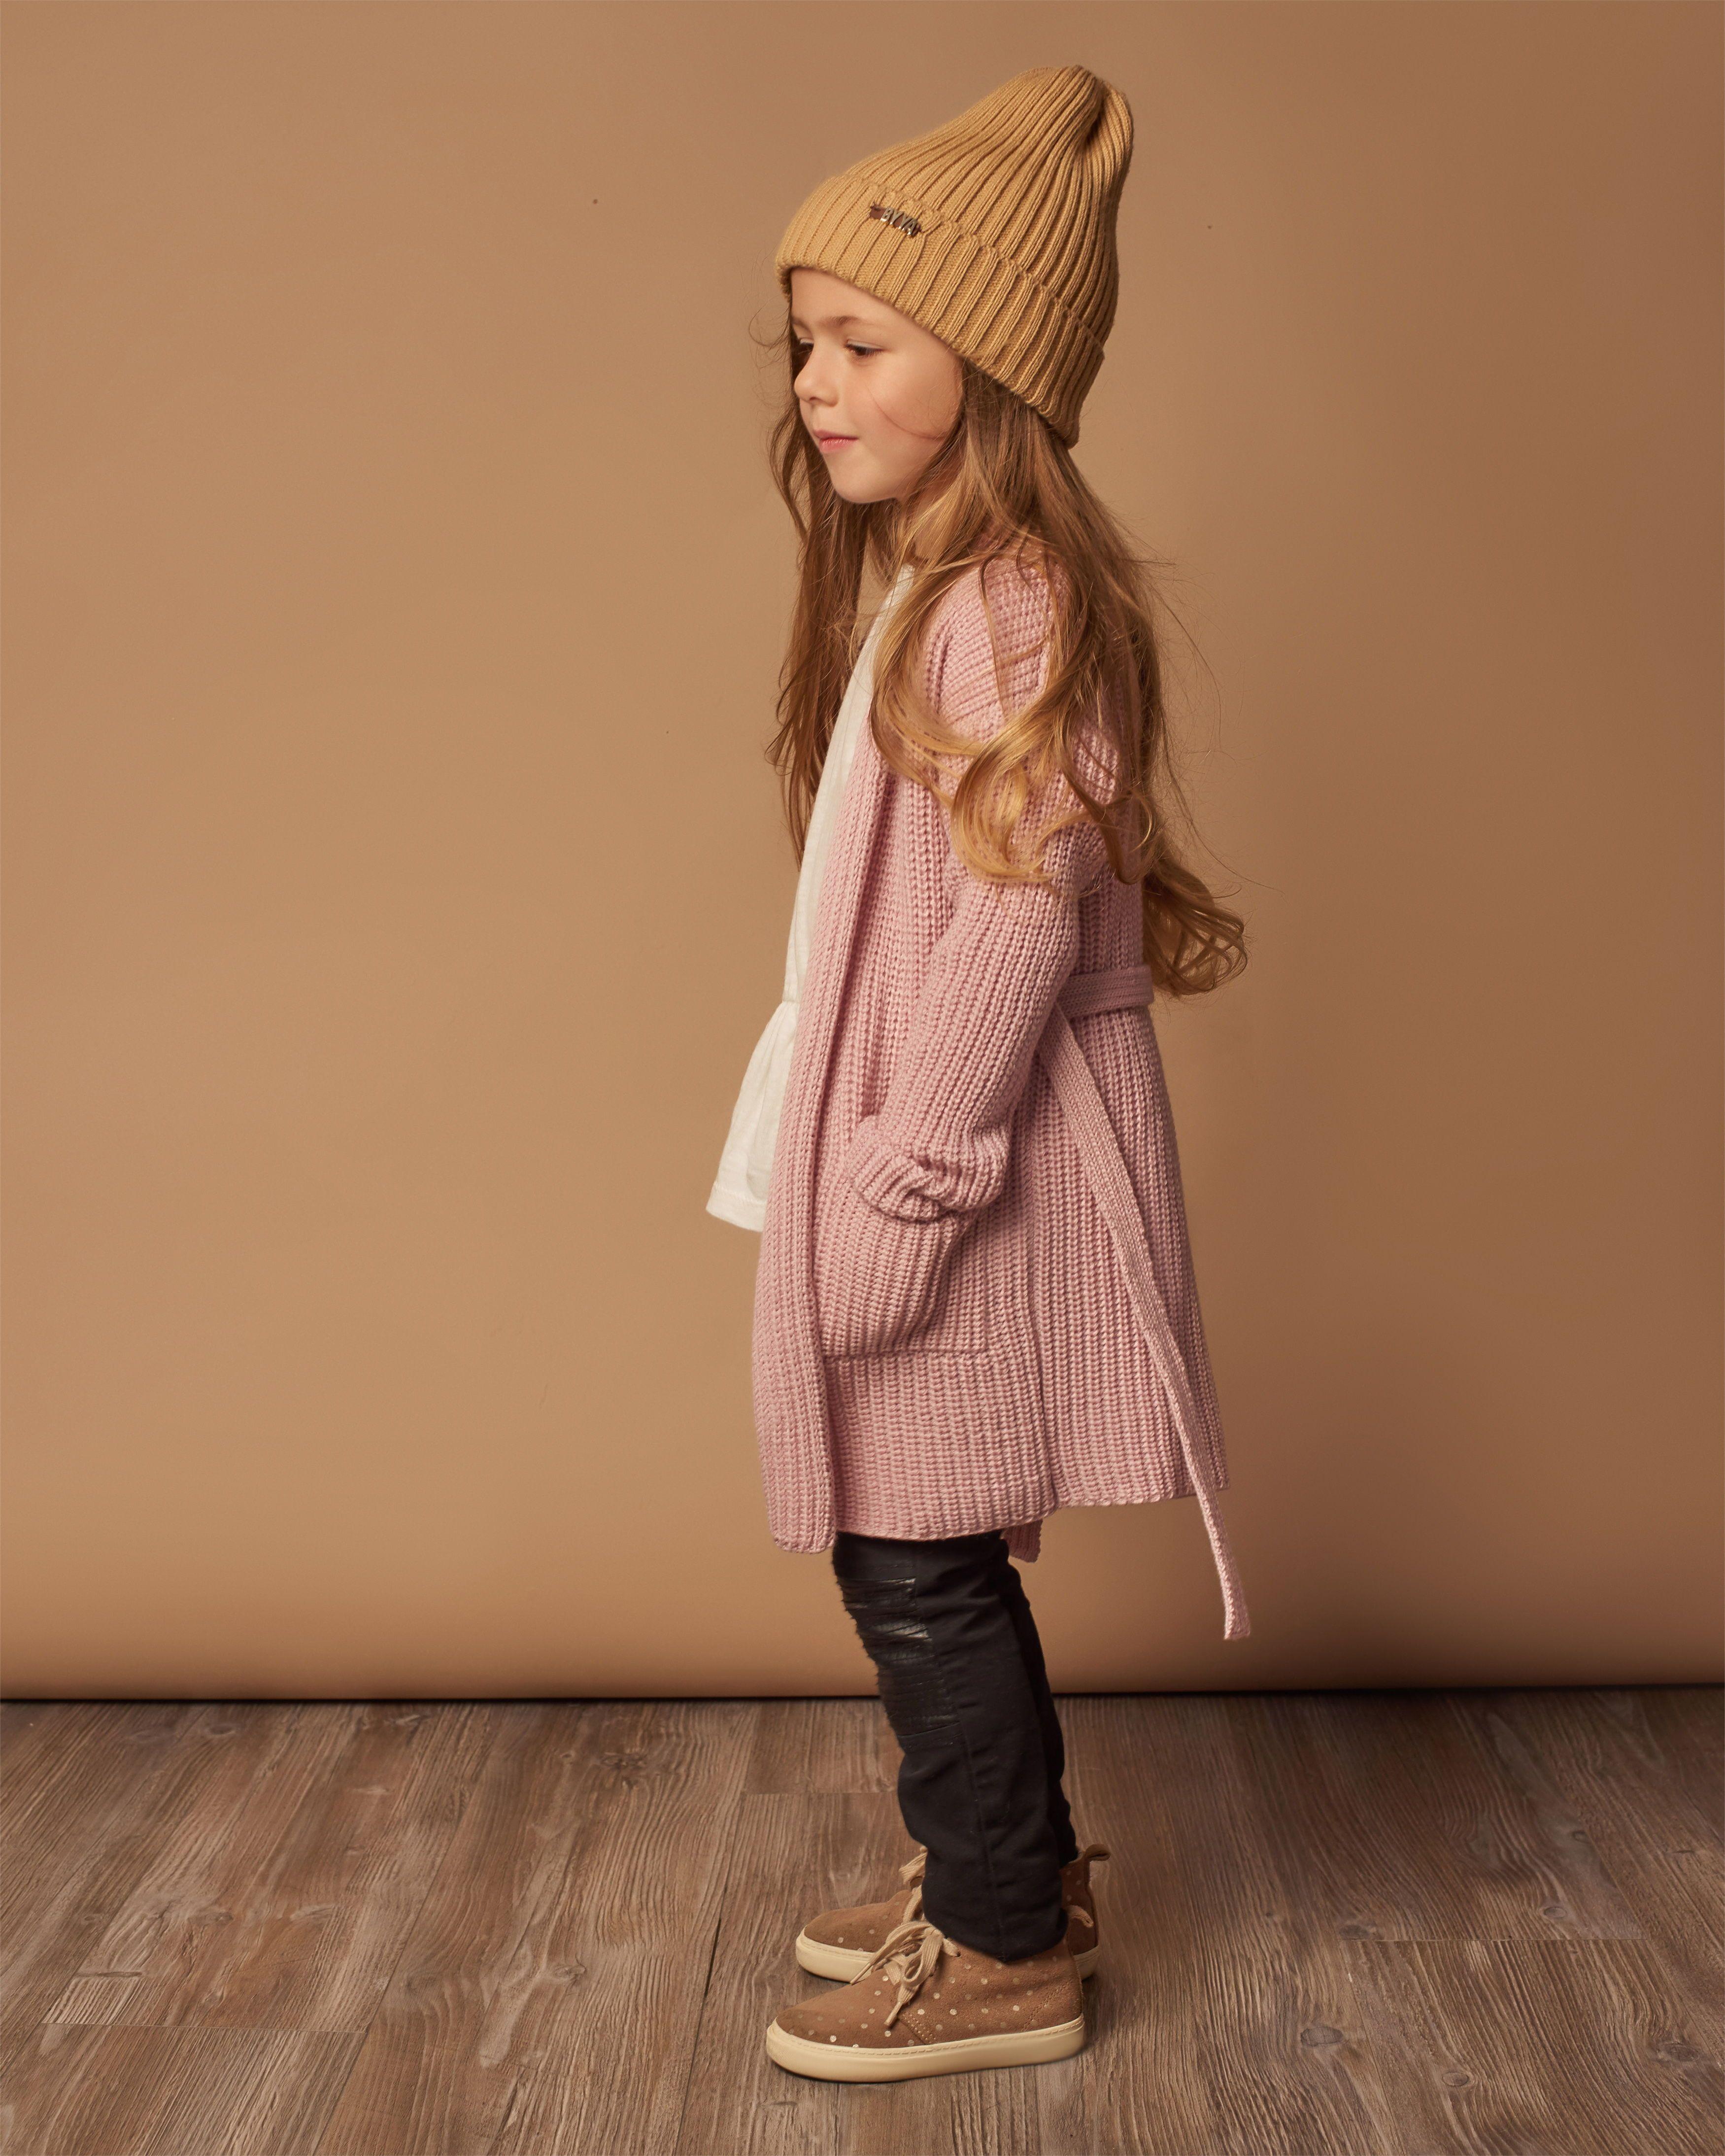 Kids Cardigan, Crochet Sweater, Knitted Wool Sweater, Toddler Cardigan, Kids Clothing, Knitwear, Girls Clothing, Crochet Cardigan